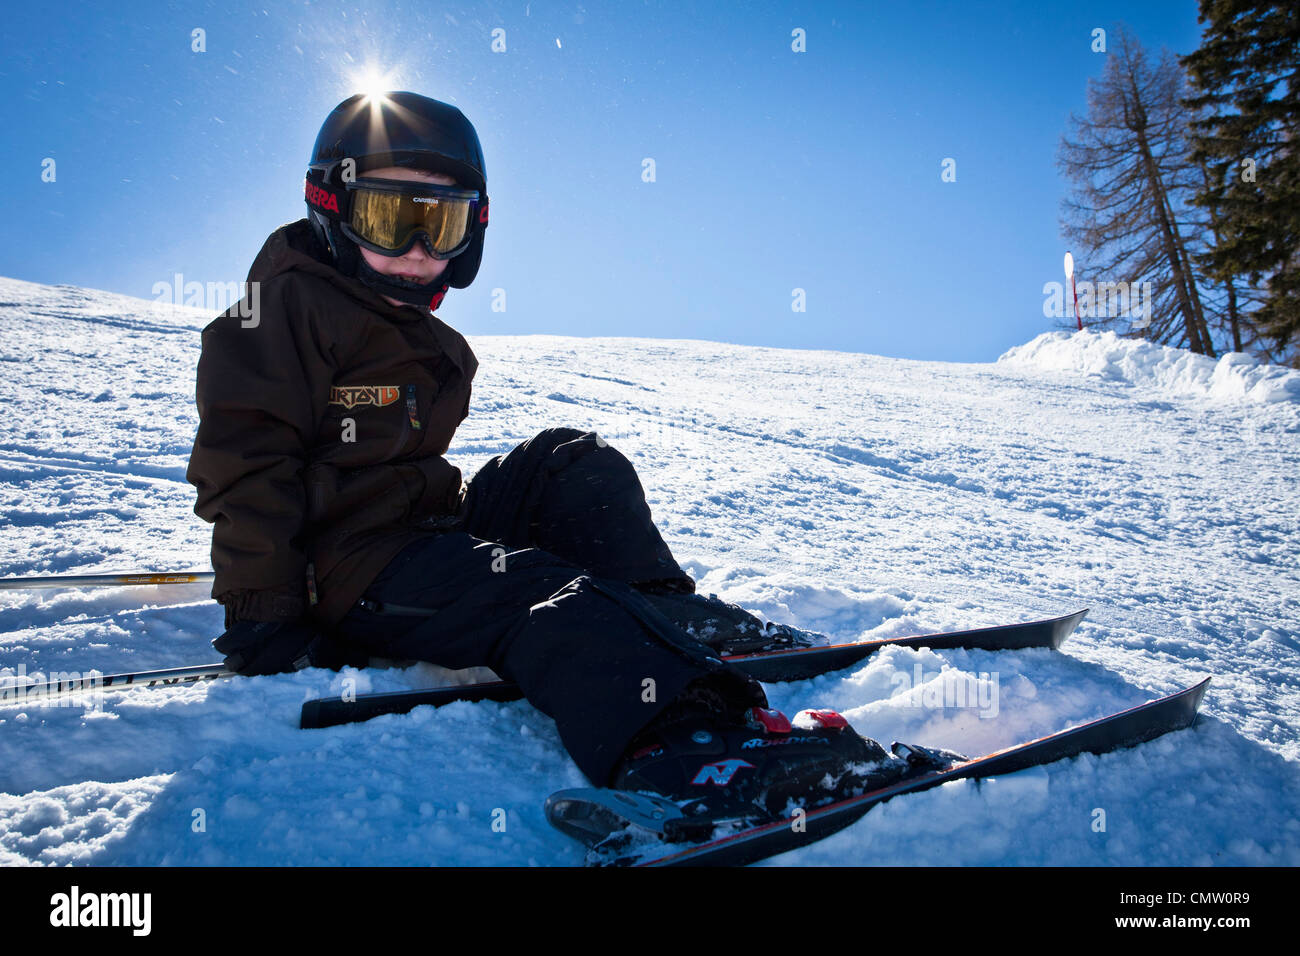 Gull longueur d'un garçon en pente de ski Photo Stock